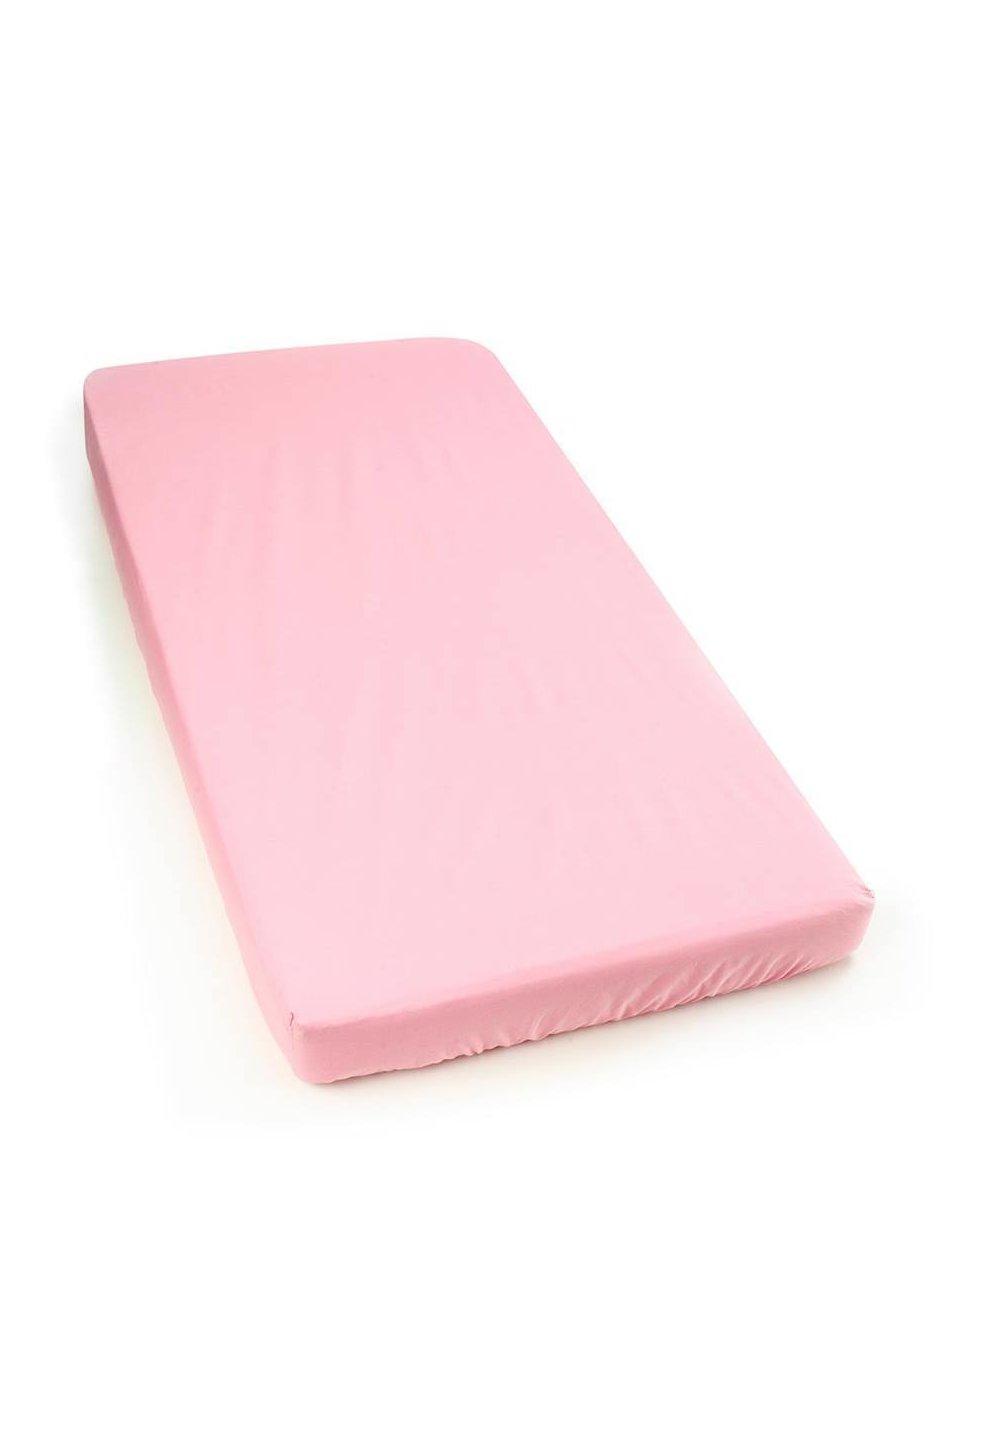 Cearceaf bumbac, roz, 140 X 70 cm imagine